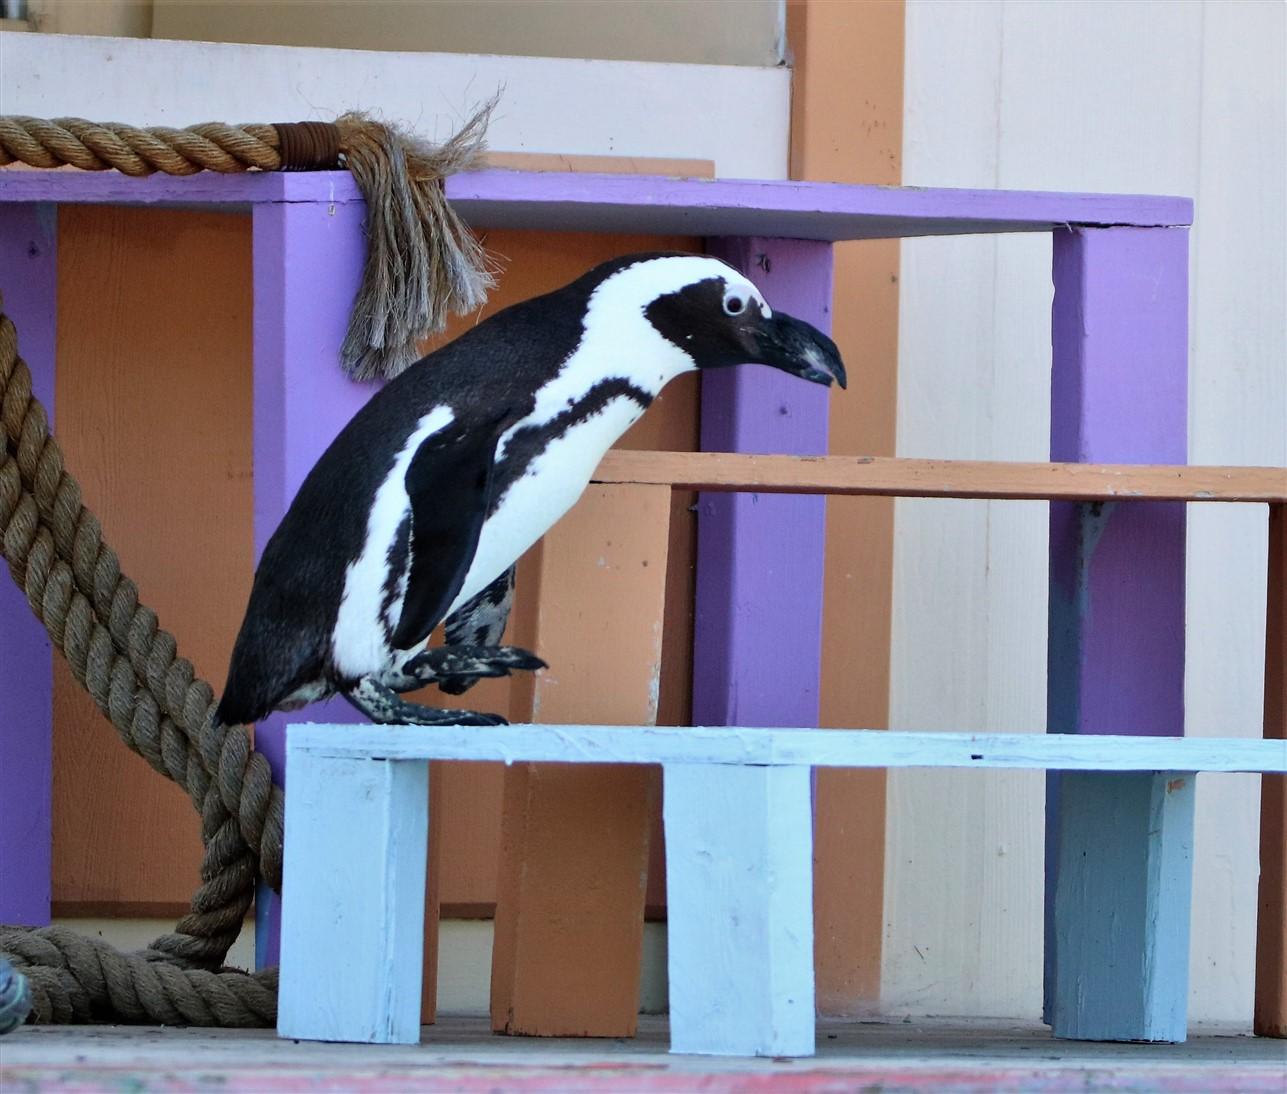 2017 10 01 175 Columbus Zoo.jpg